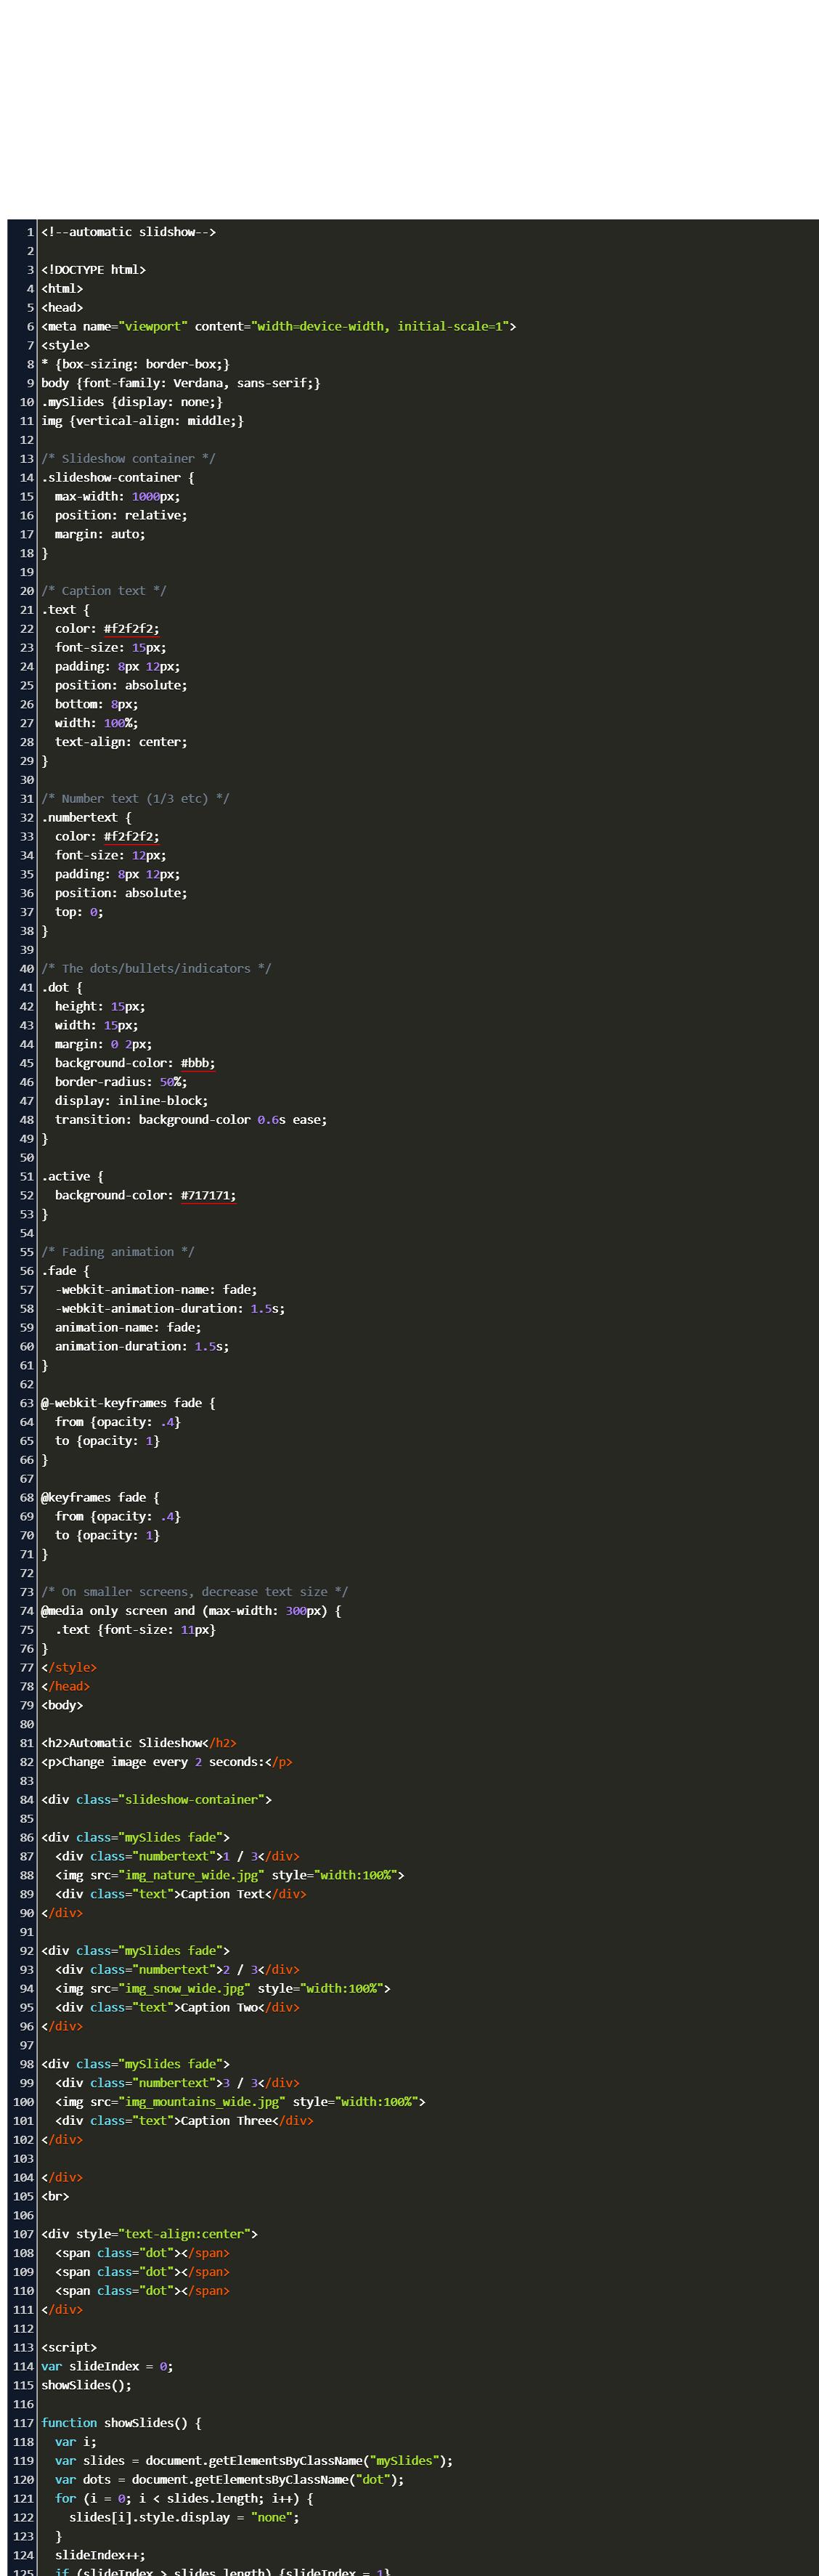 w20schools slider image Code Example